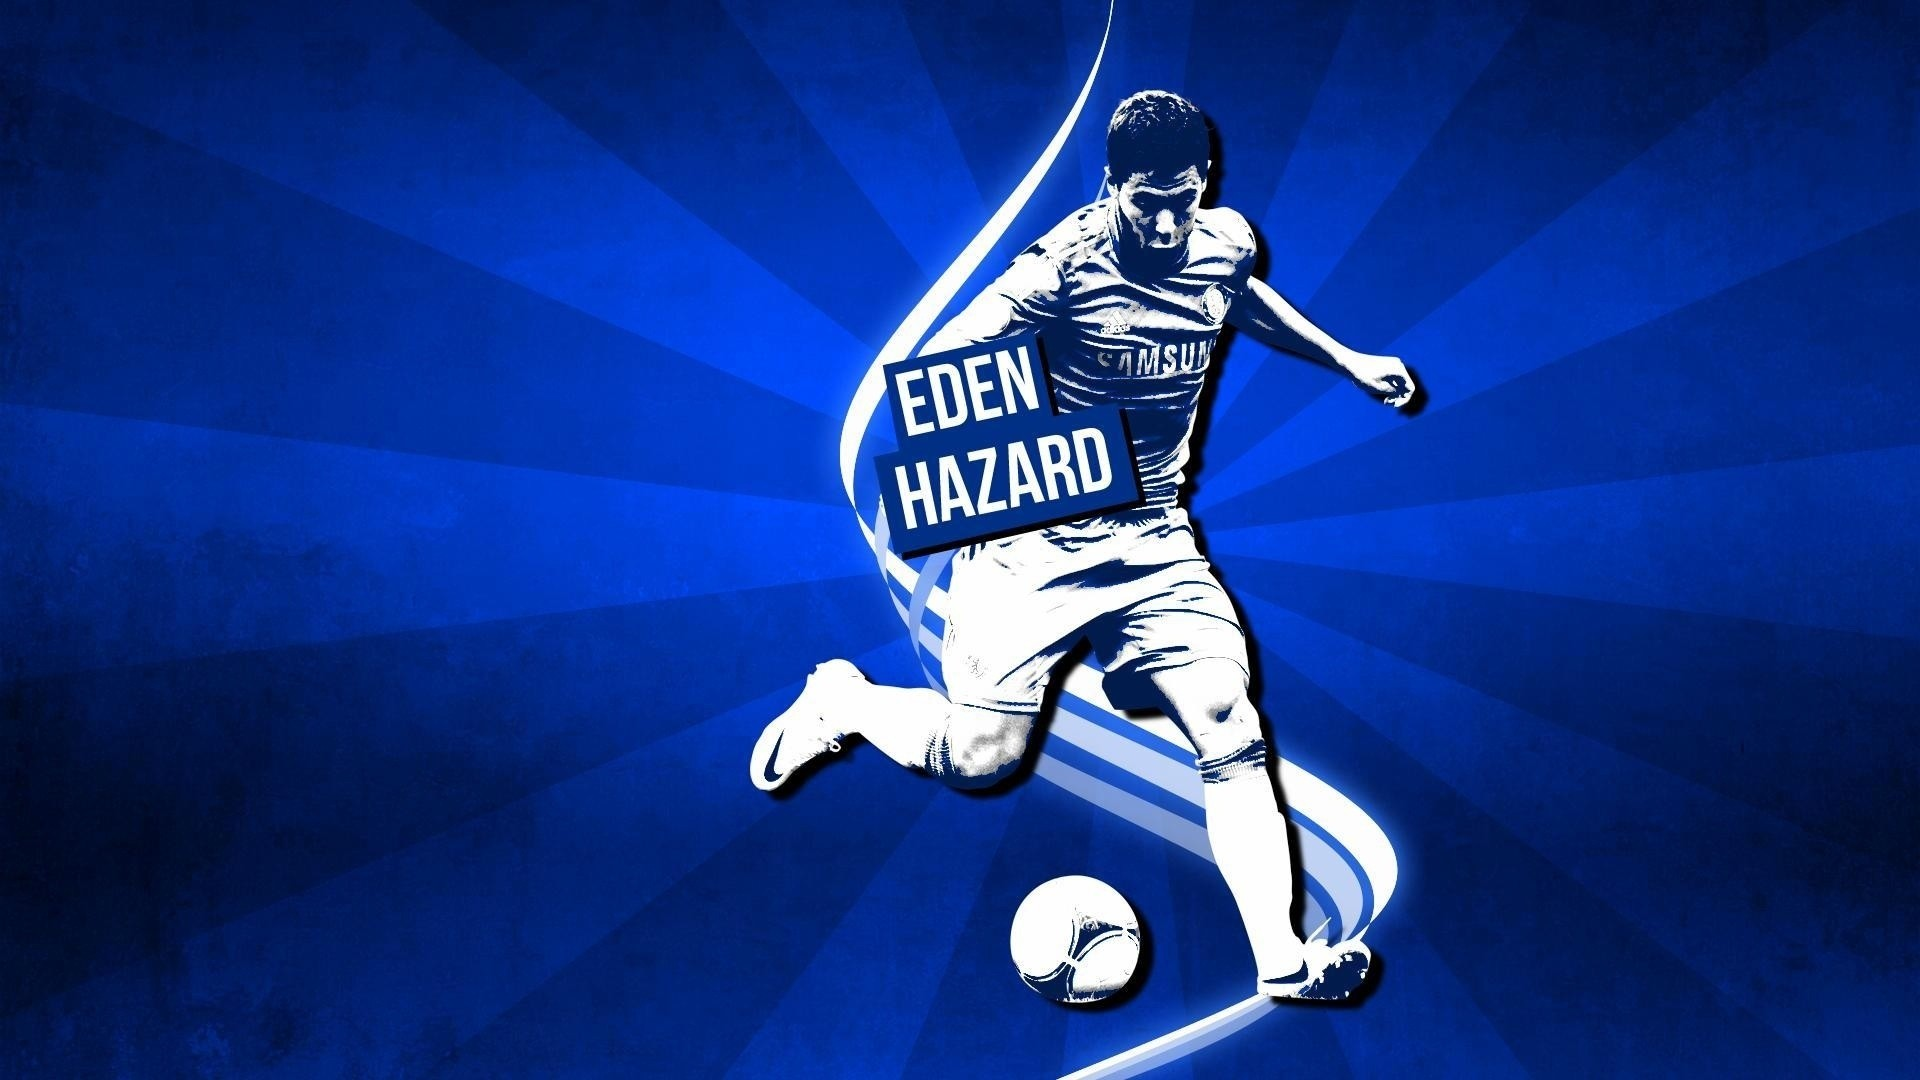 Eden Hazard full hd wallpaper